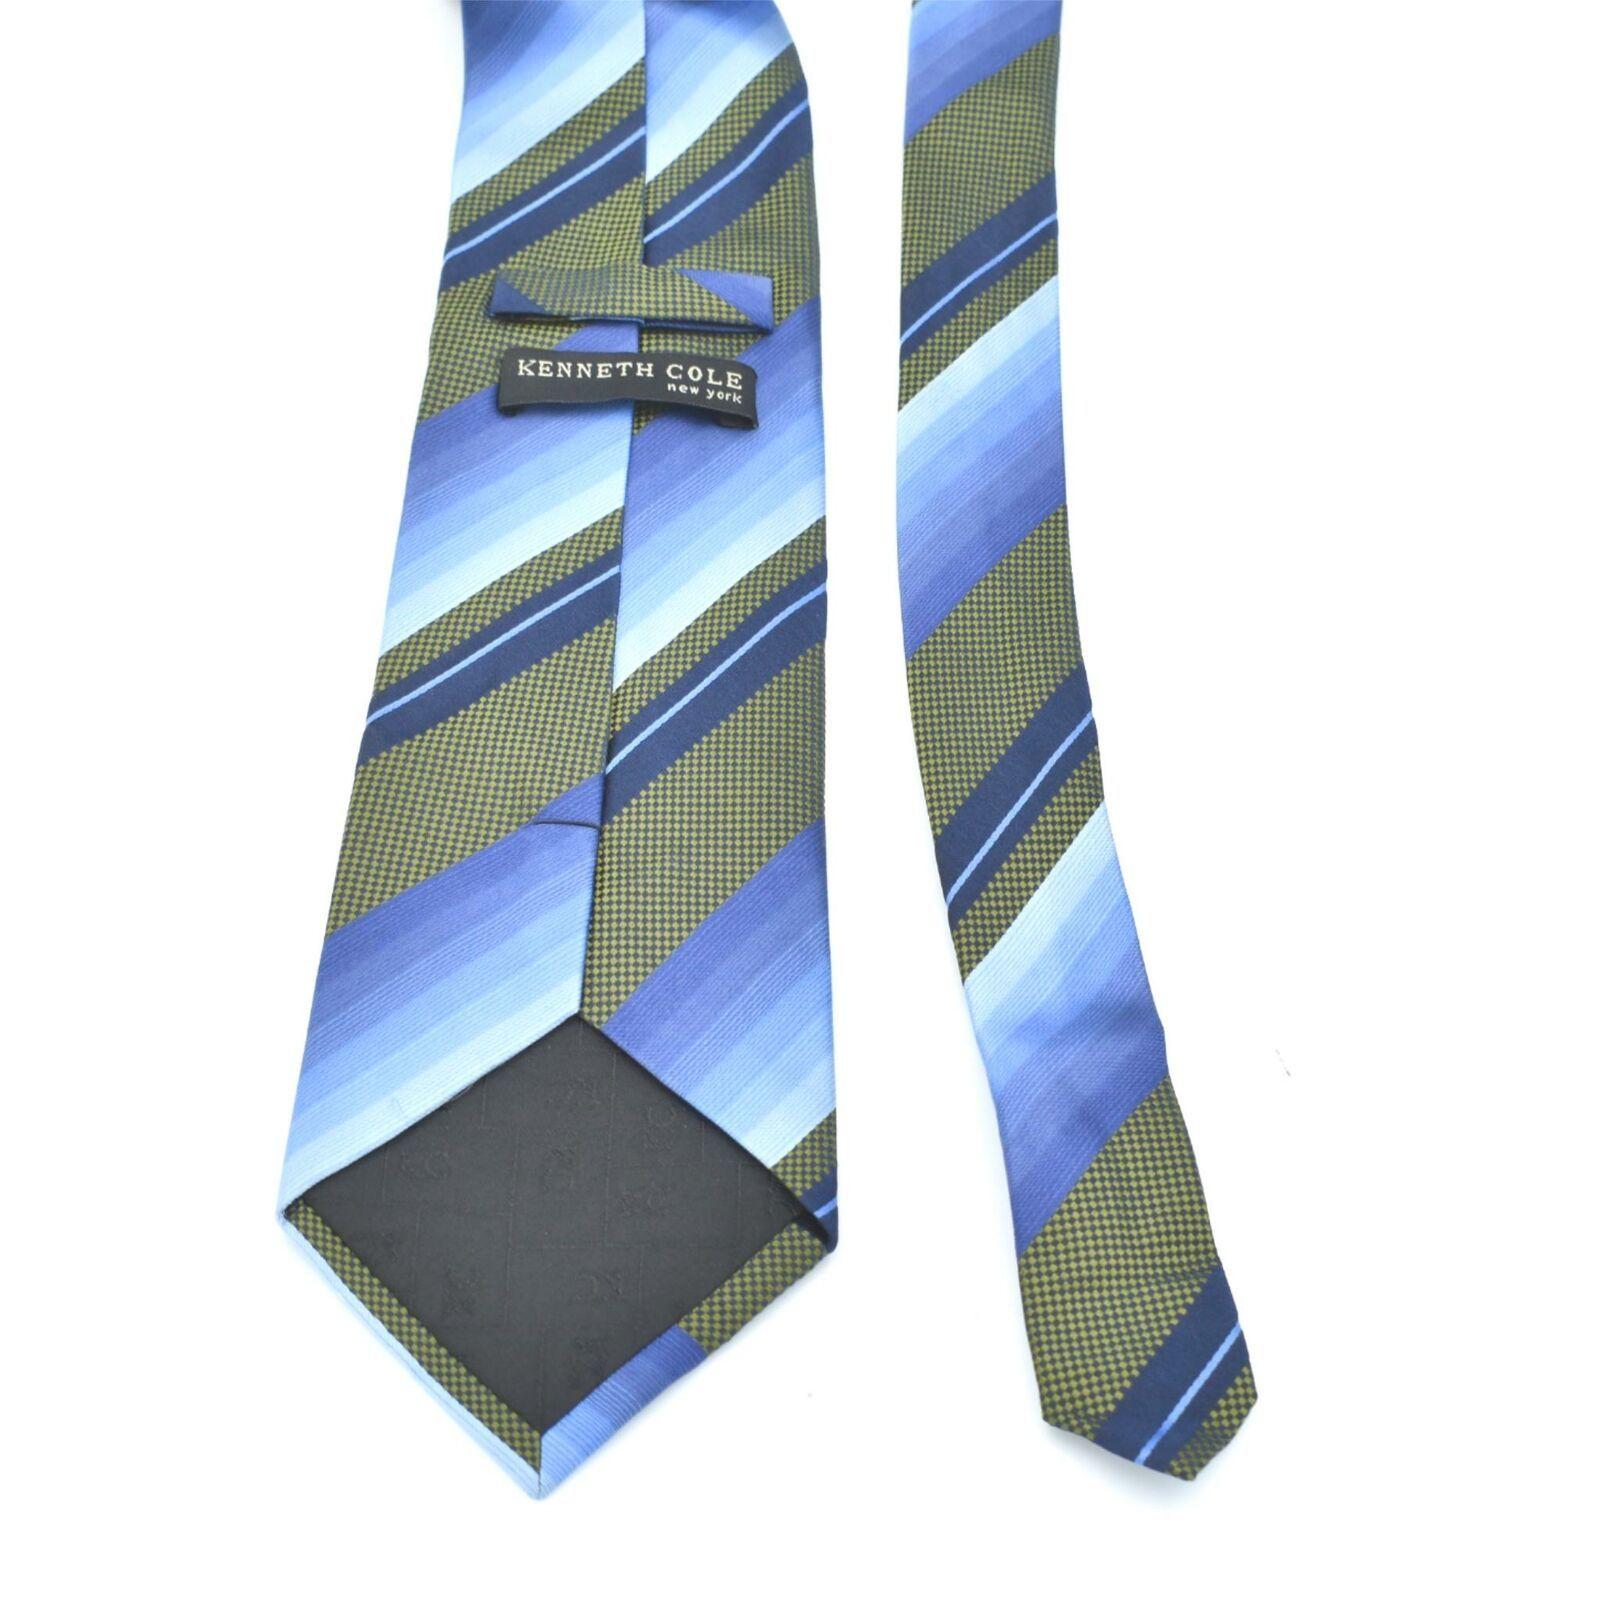 Kenneth Cole Blue Green Diagonal Stripes Silk Tie Necktie image 3